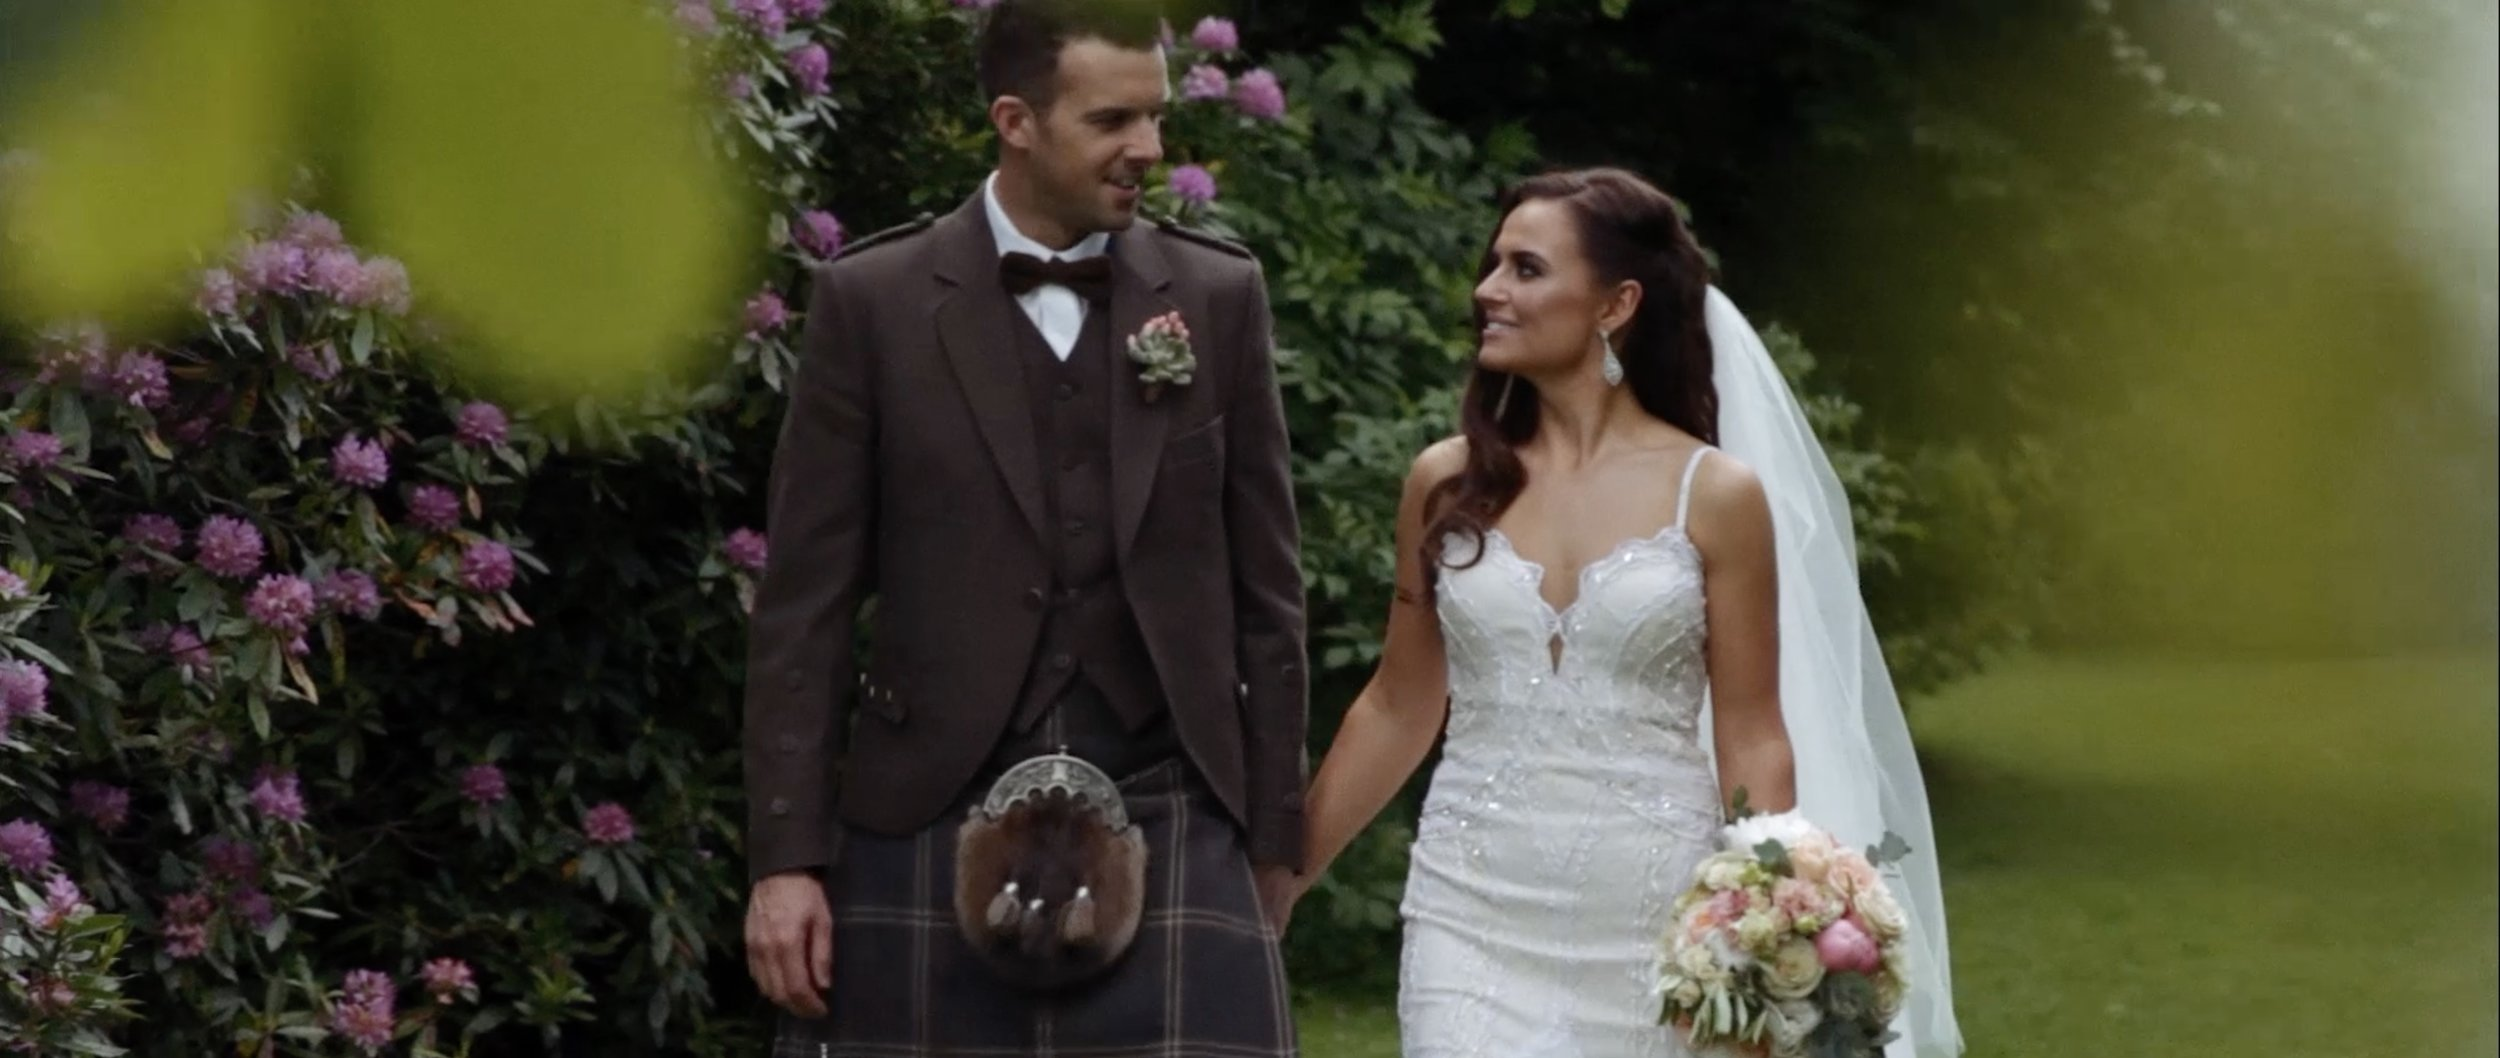 cambo-estate-wedding-videographer_LL_06.jpg